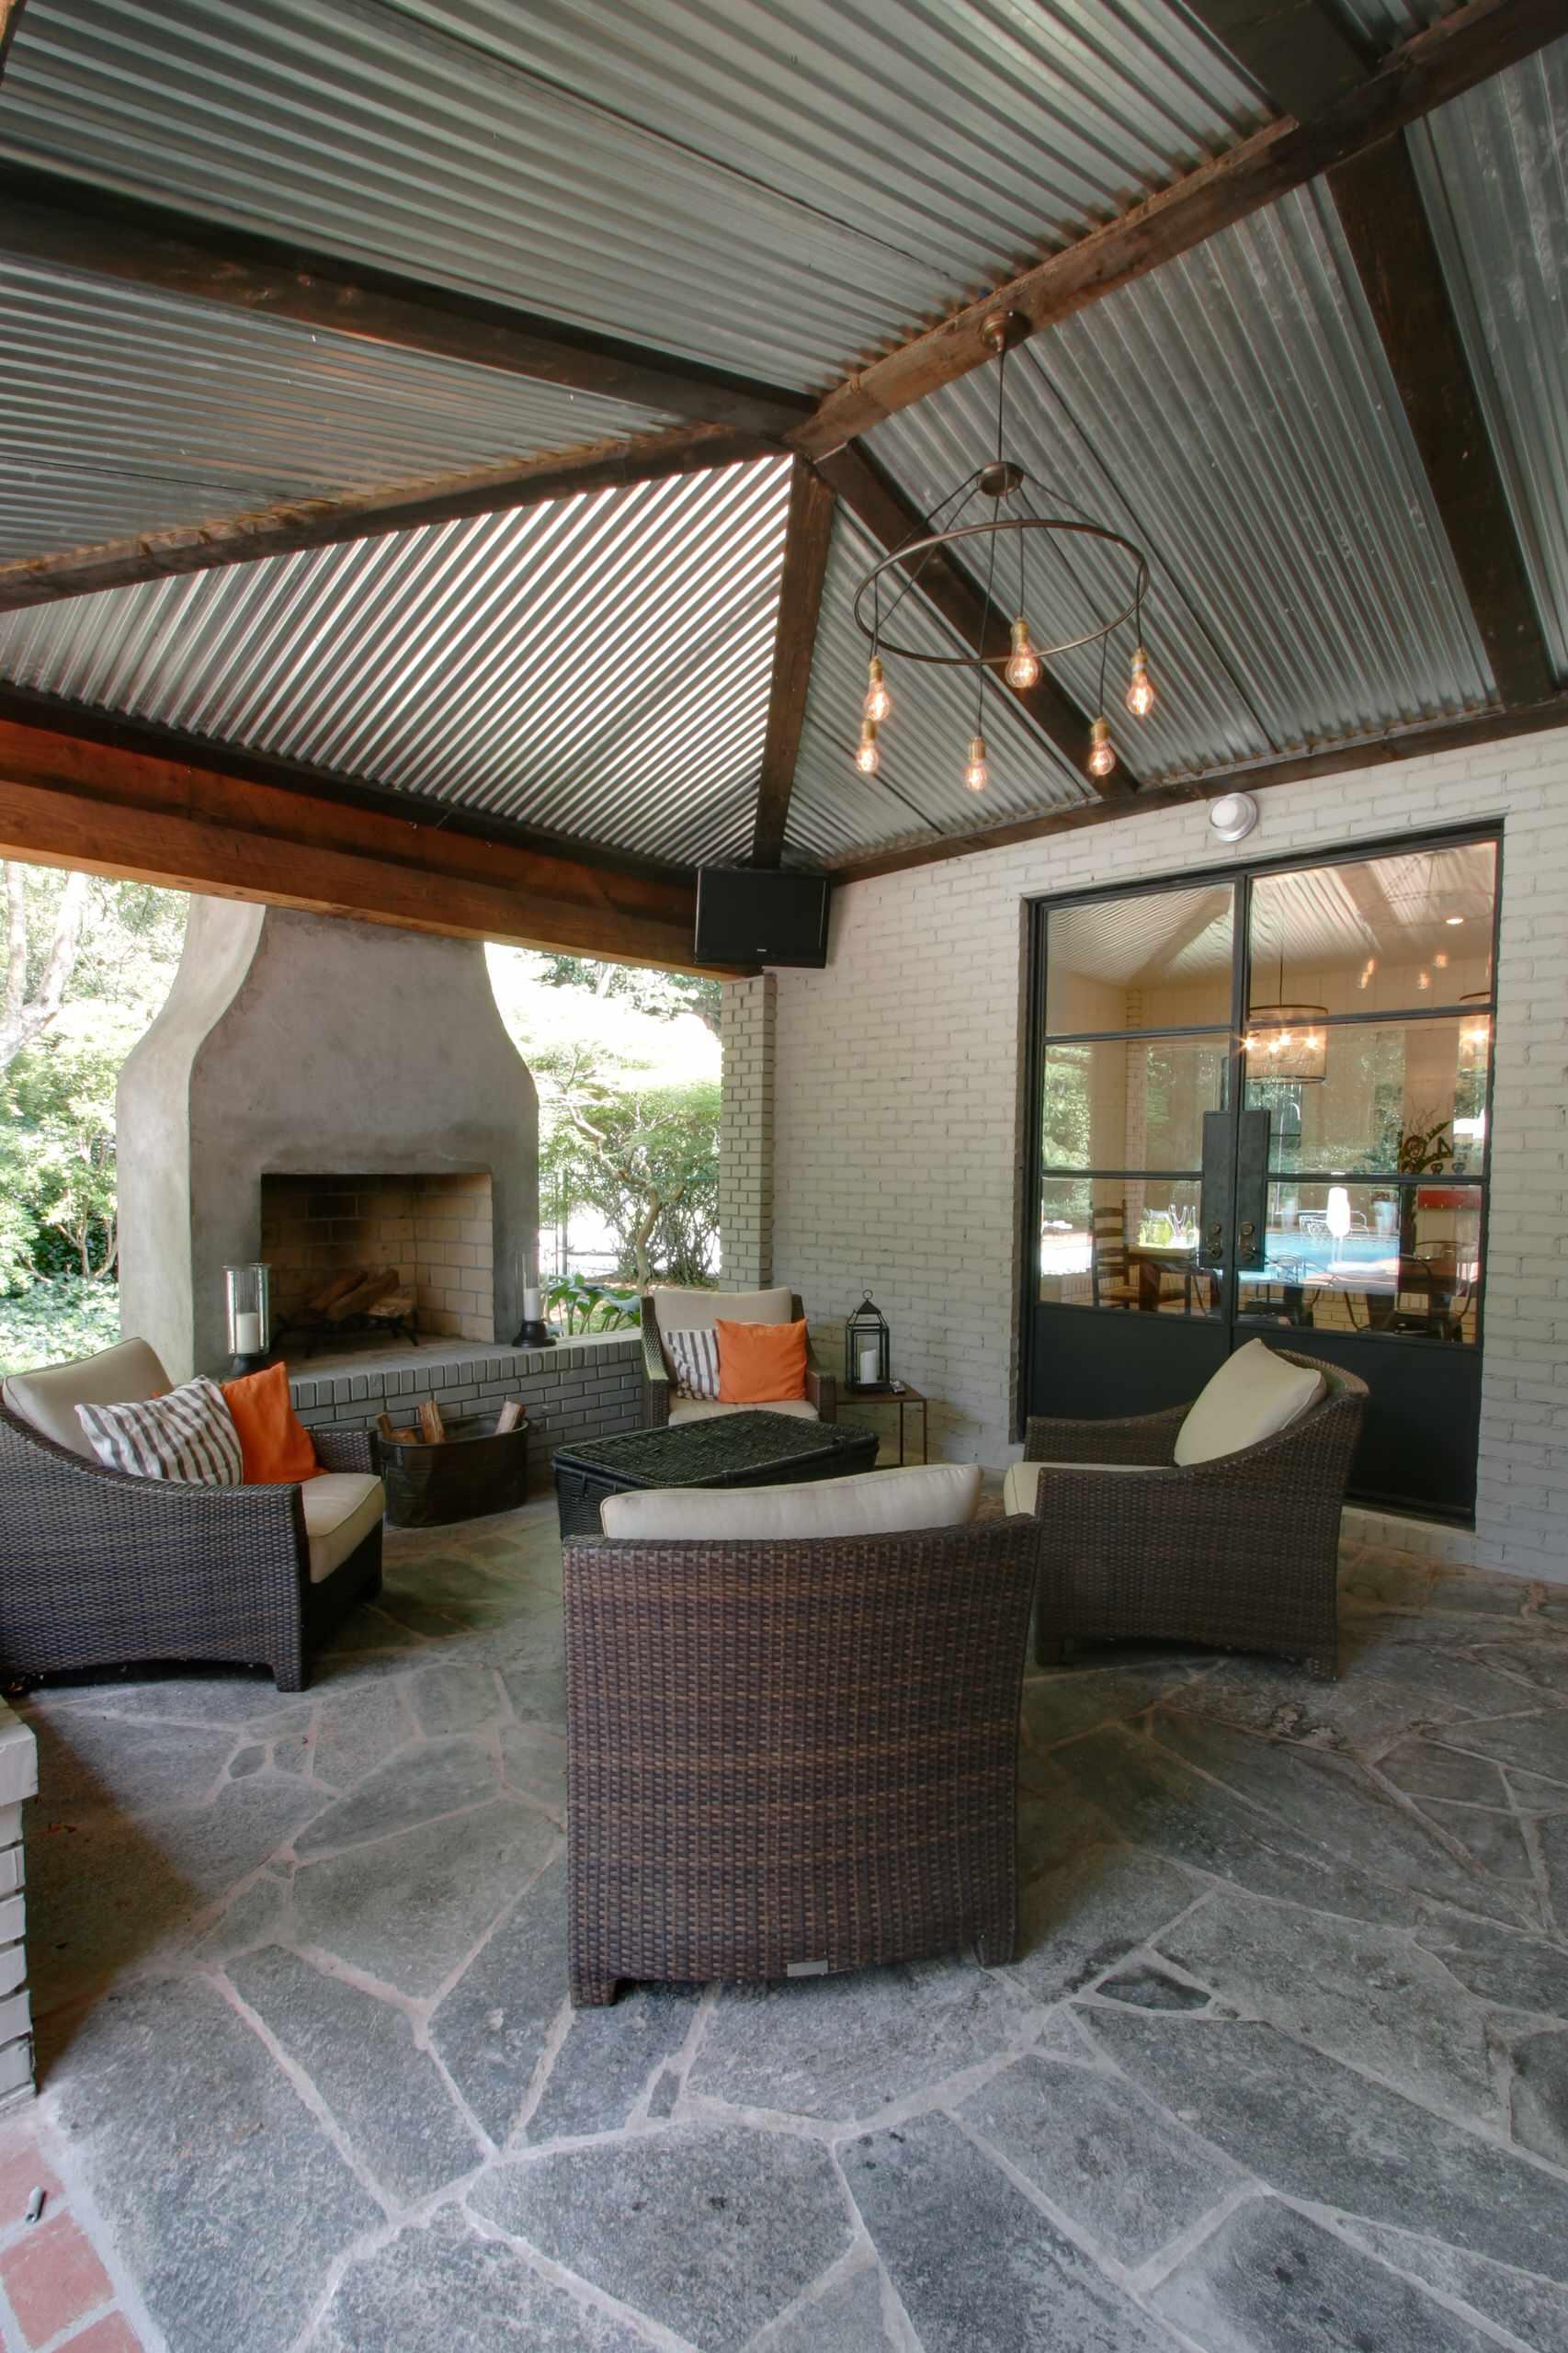 Corrugated Metal Roof Patio Ideas